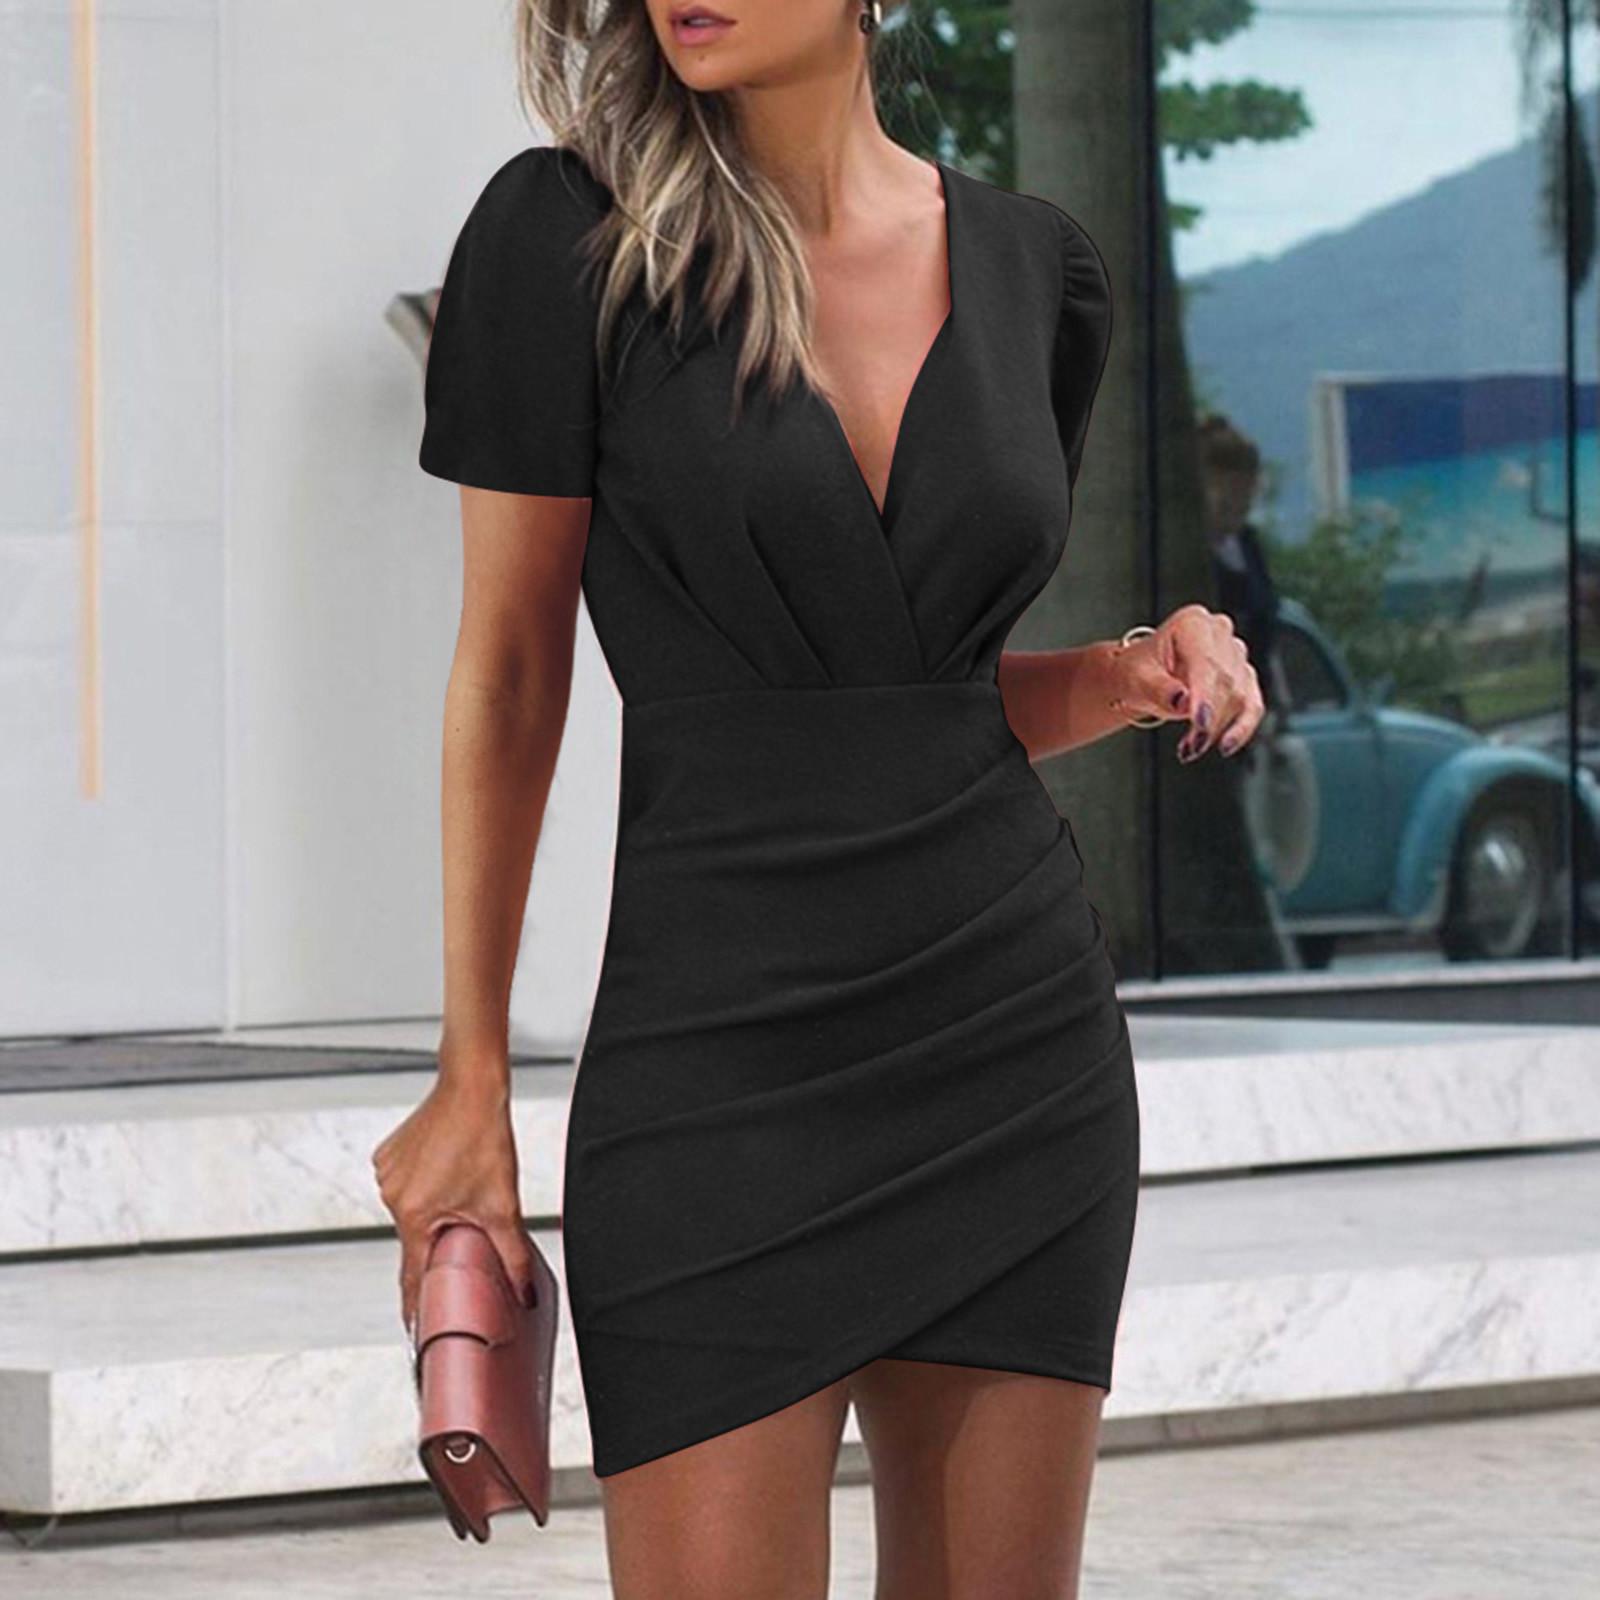 F# Office Lady Women's Dress Bodycon Bandage Pleated Dresses Sexy Solid Color V neck Sleeveless Short Sleeve Sheath Mini Dress